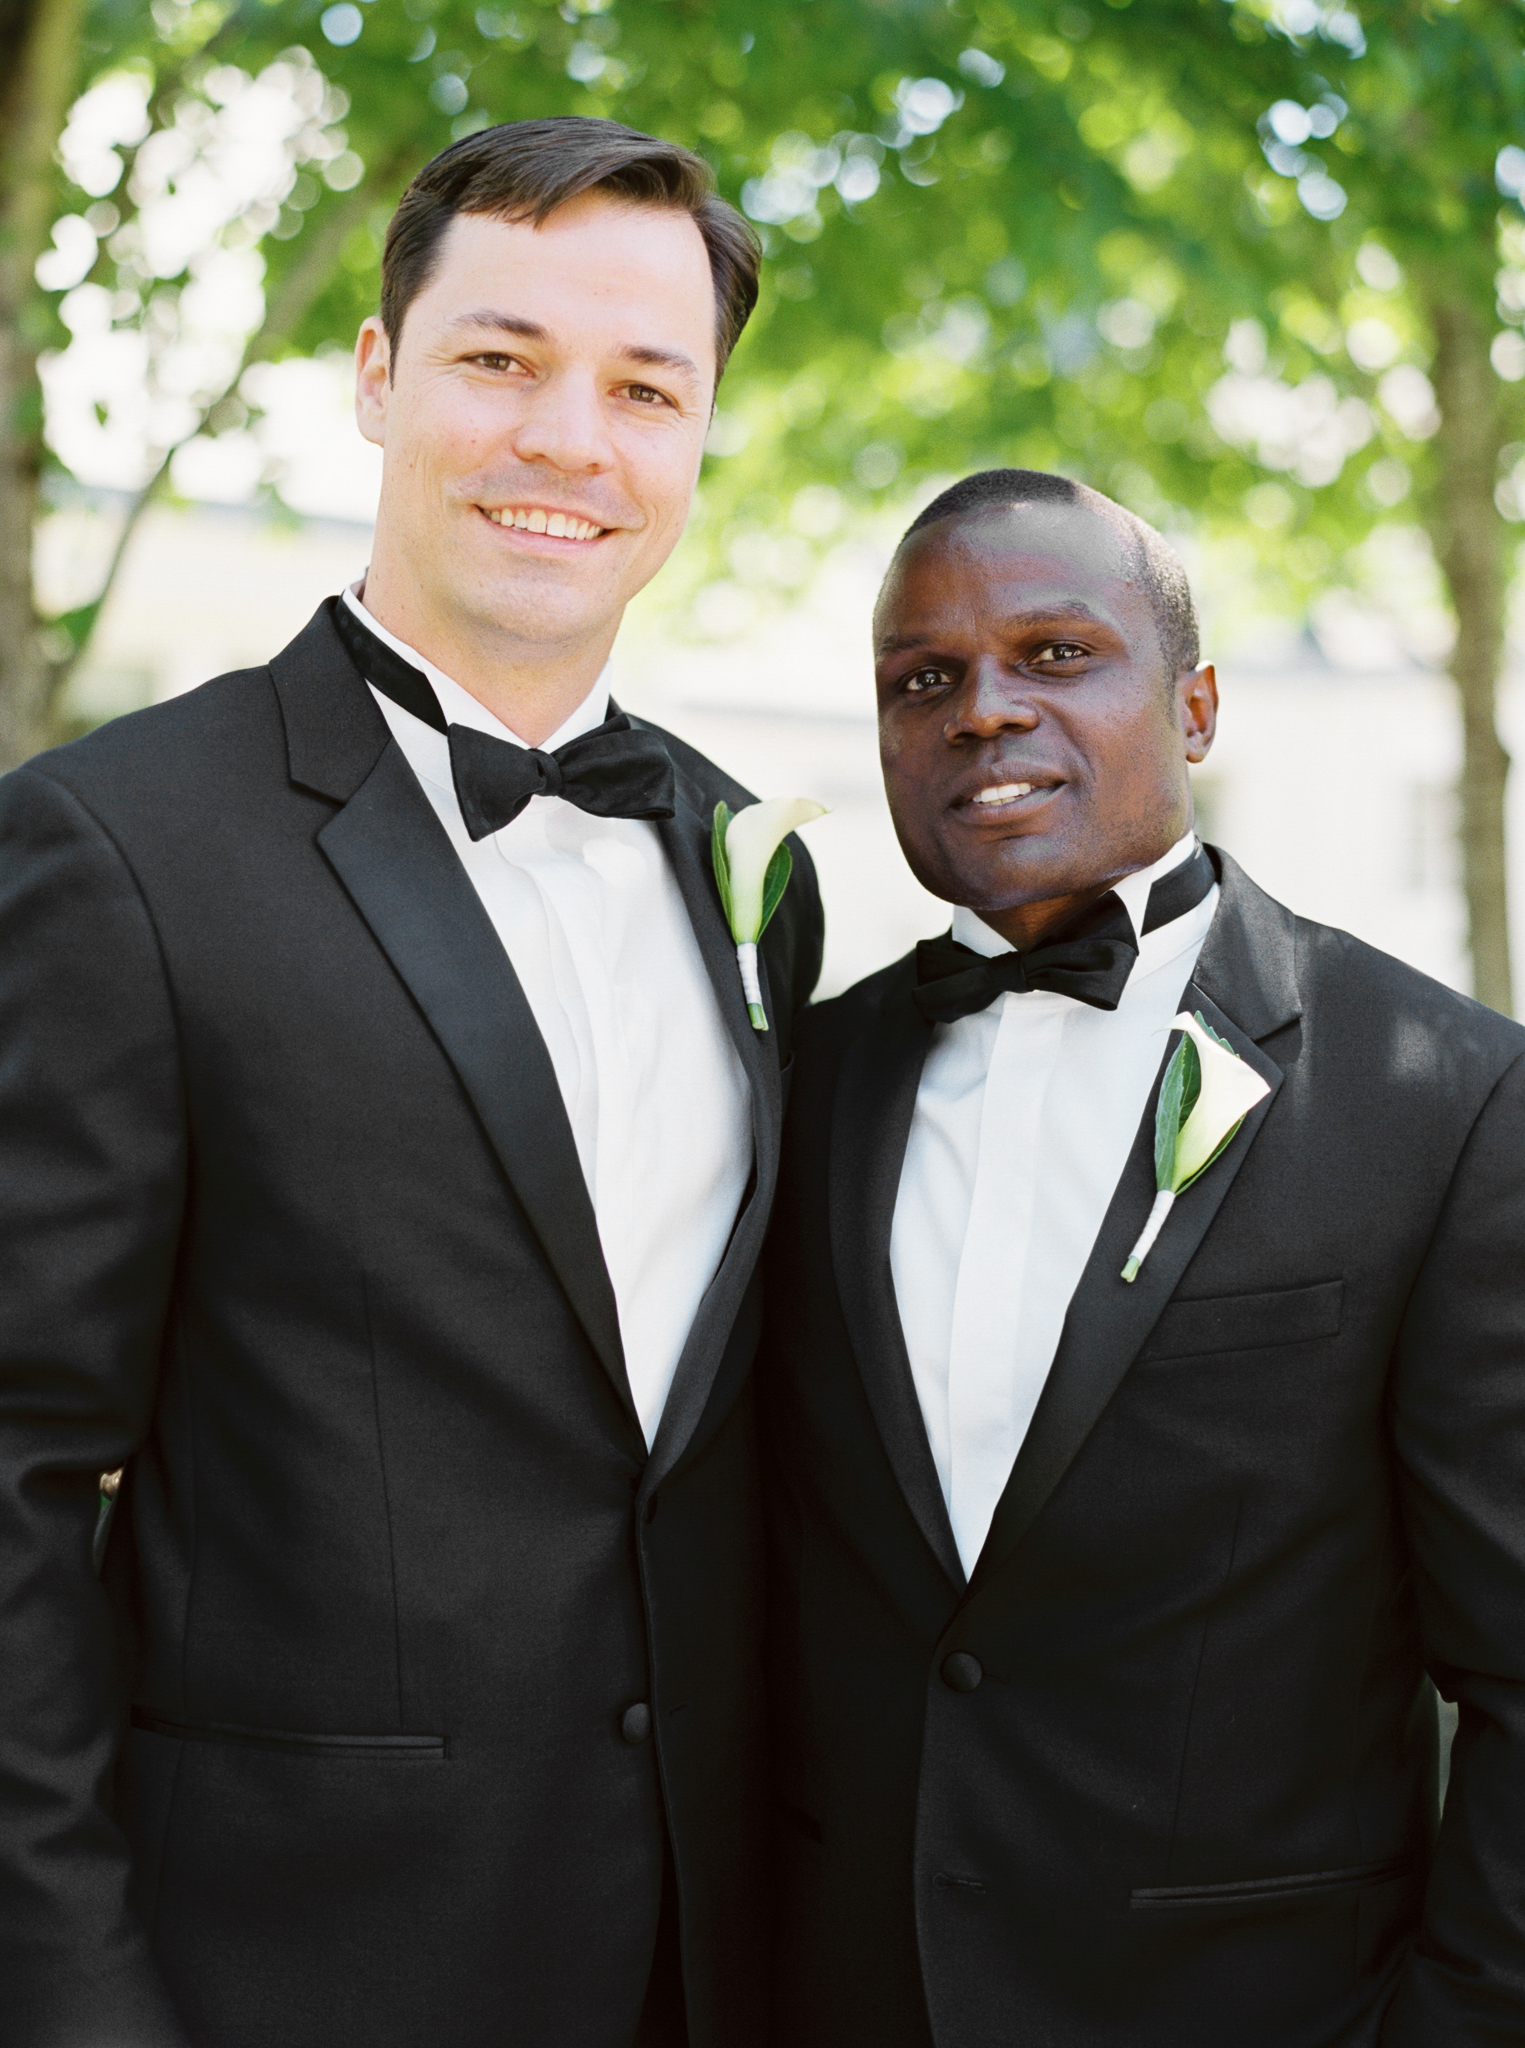 067OutliveCreative_Travel_Photographer_Videographer_Lewis&Clark_Oregon_Elegant_BlackTie_Destination_Wedding.jpg